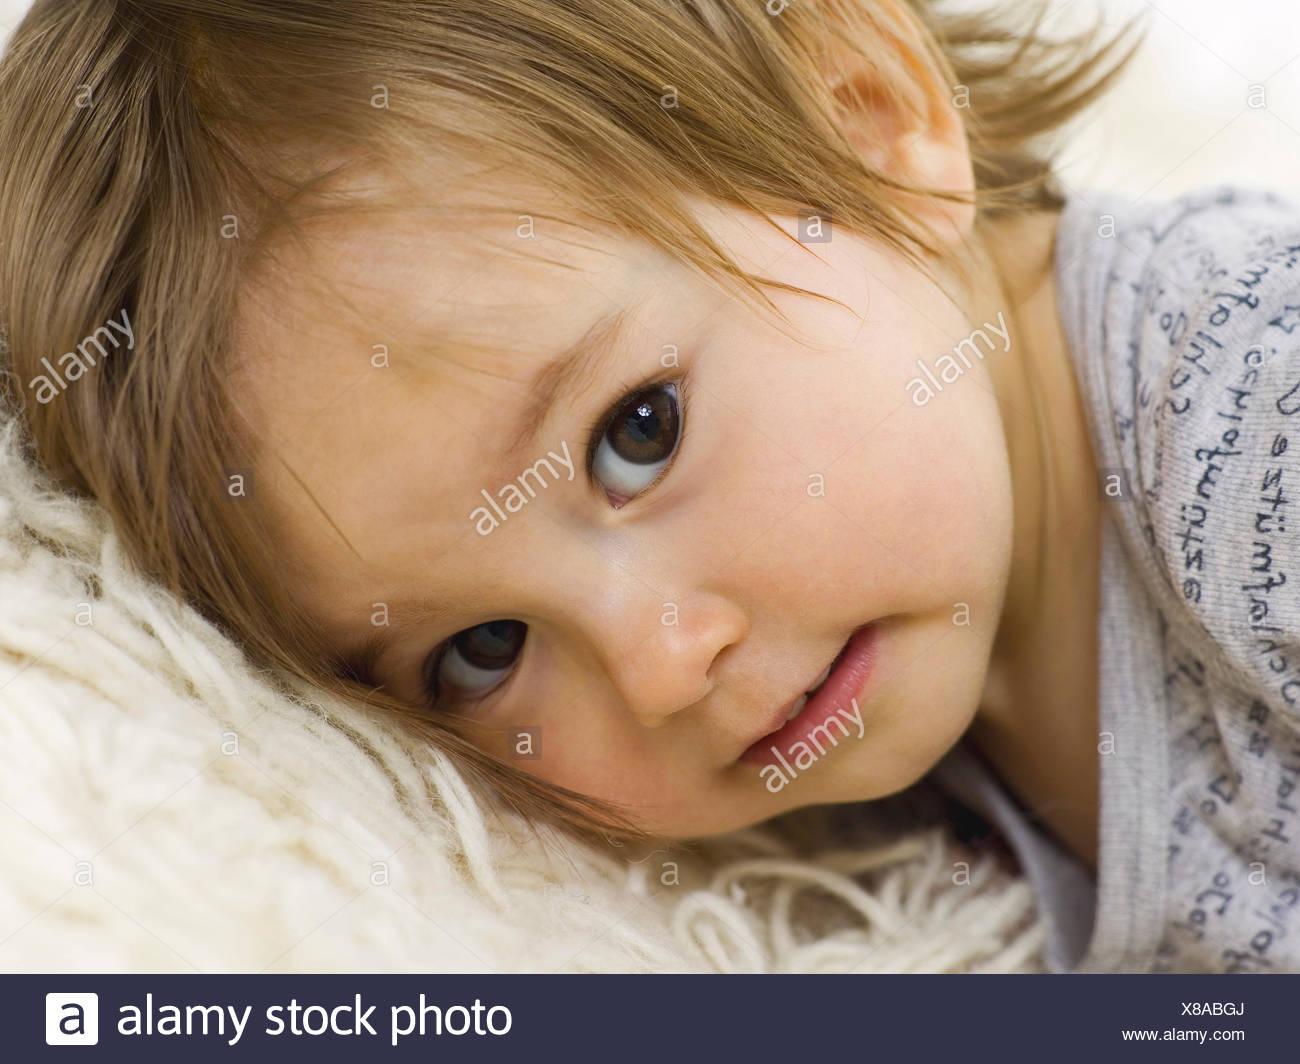 toddler,lying,cuddle - Stock Image